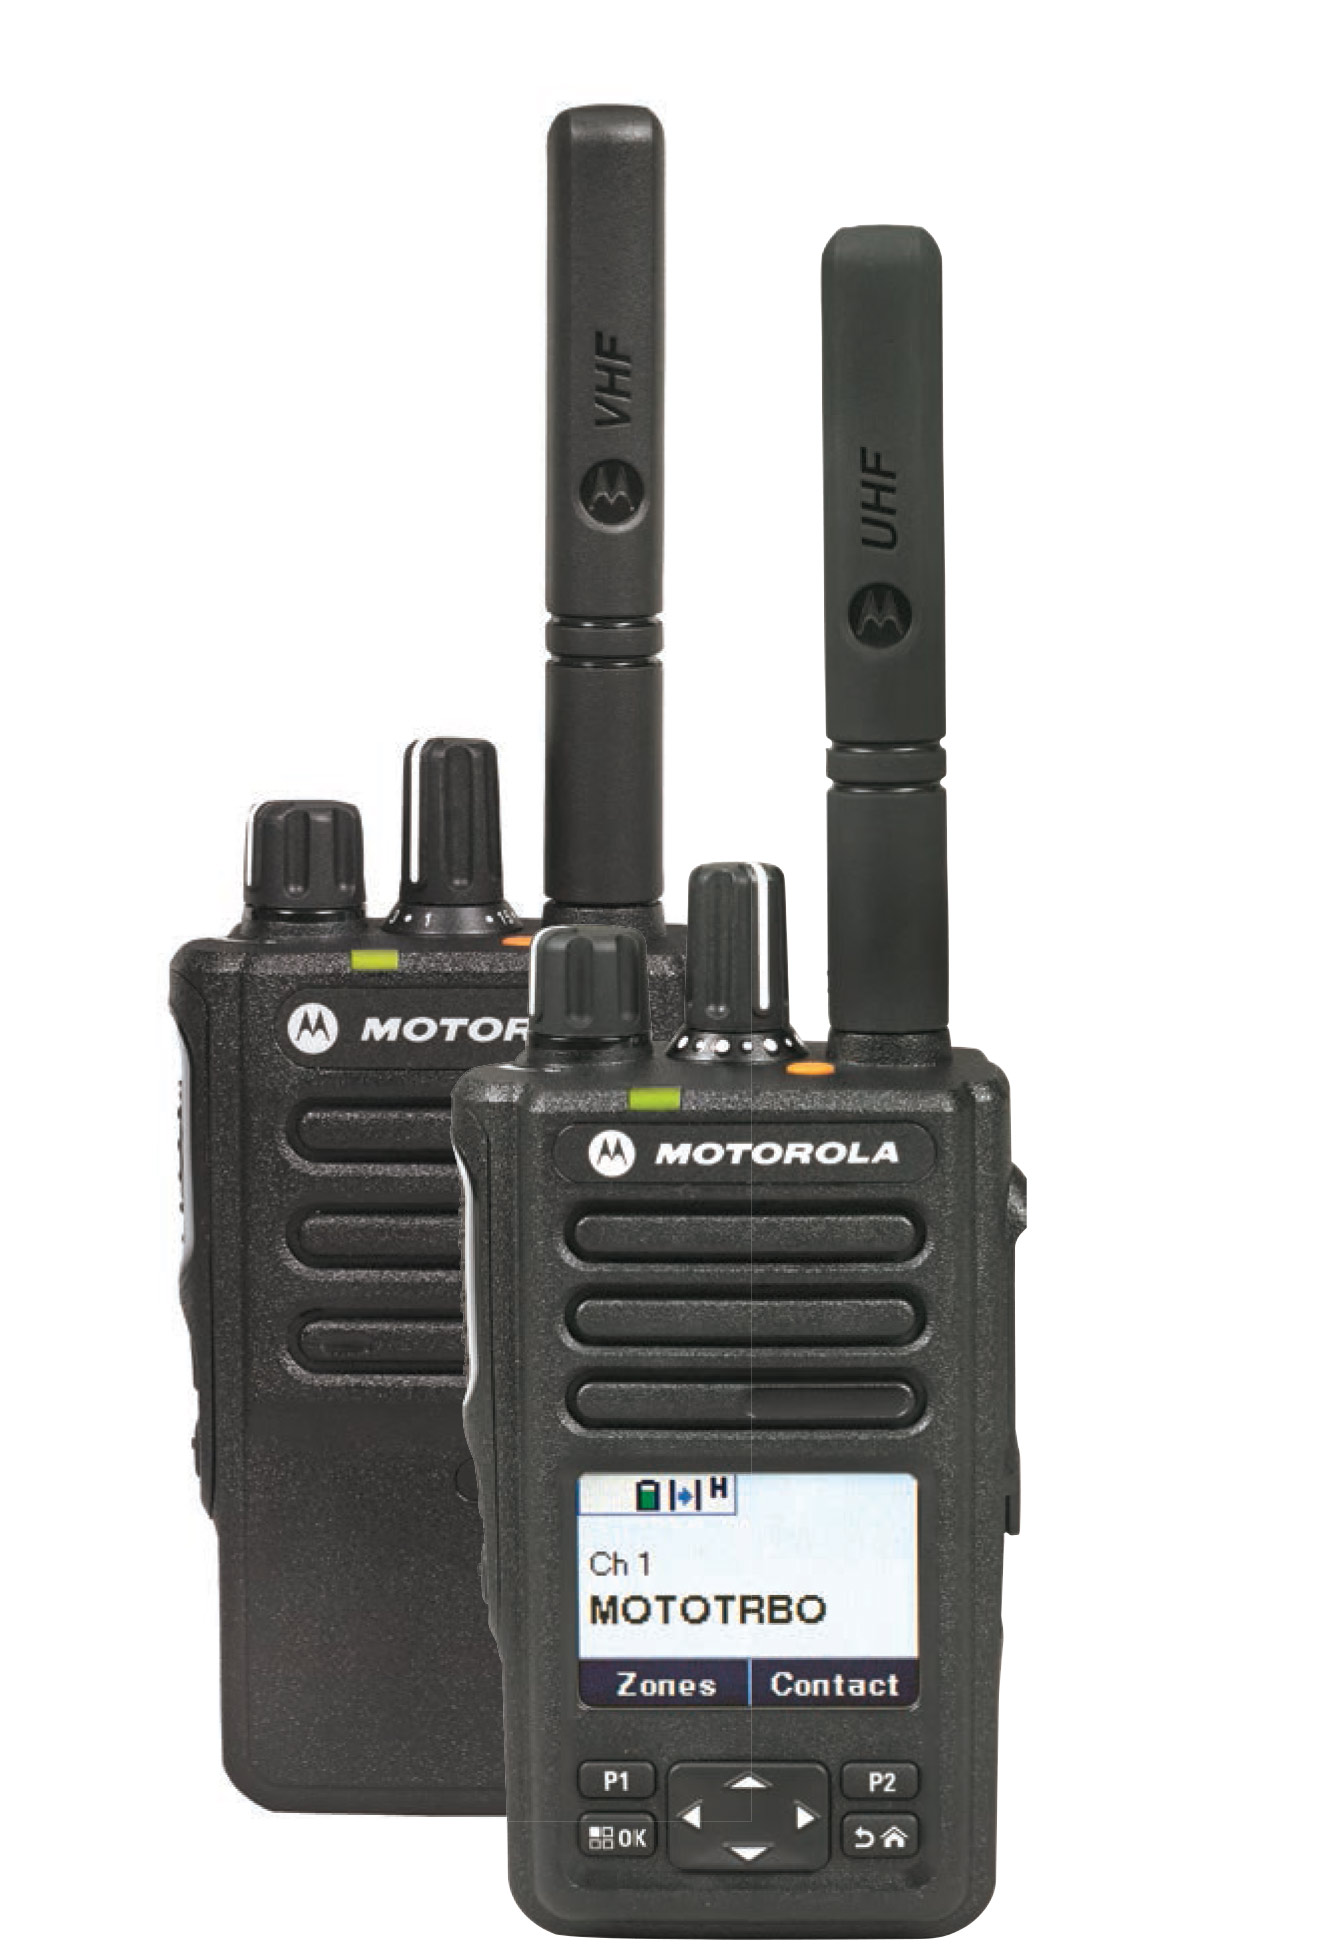 professional radio suppliers in abu dhabi